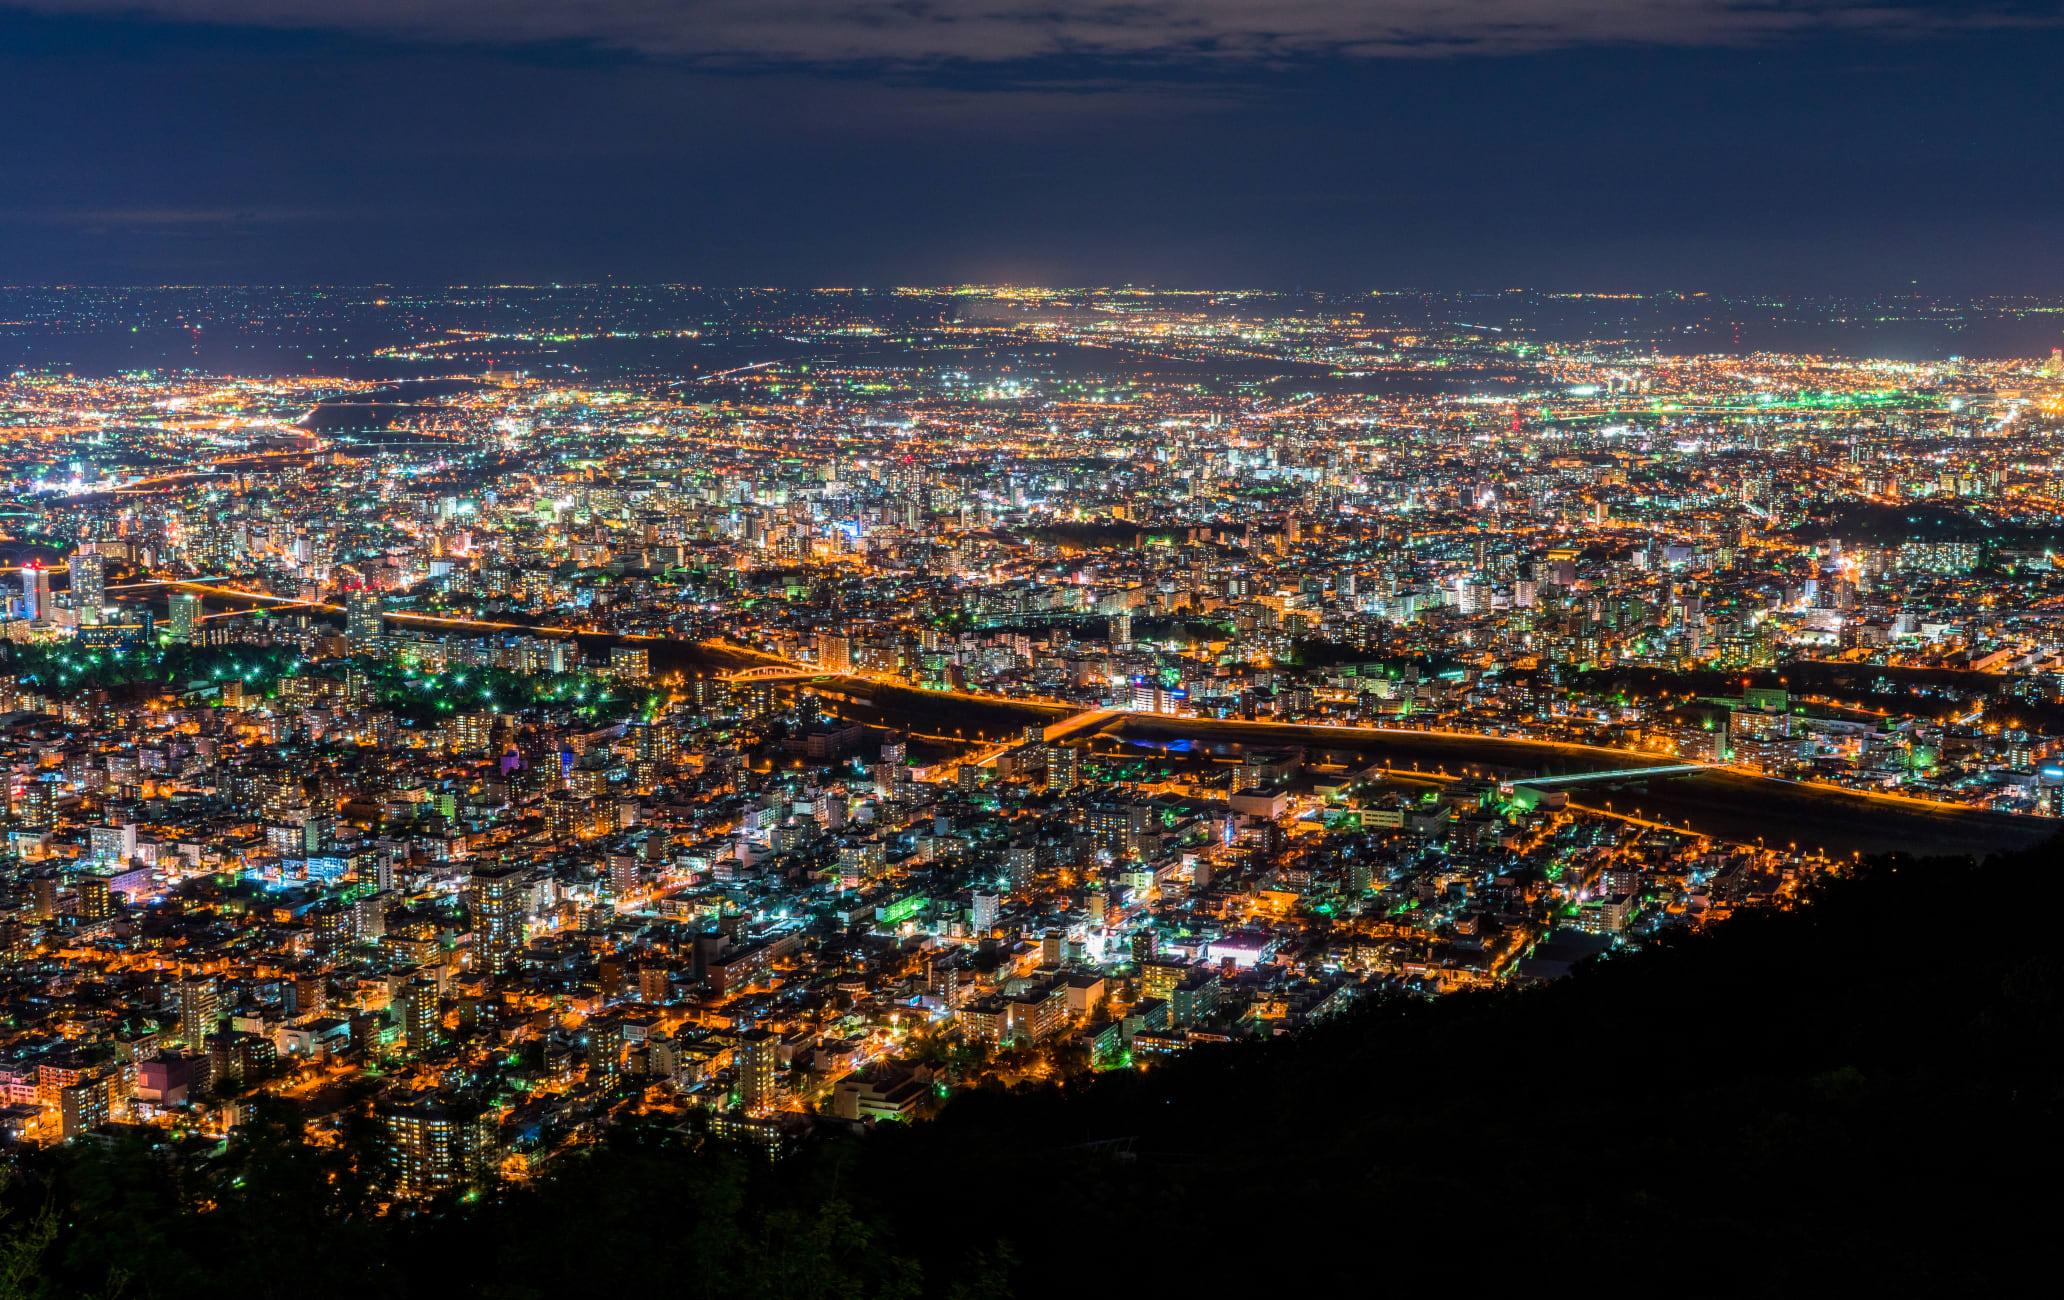 Night views from Mount Hakodate